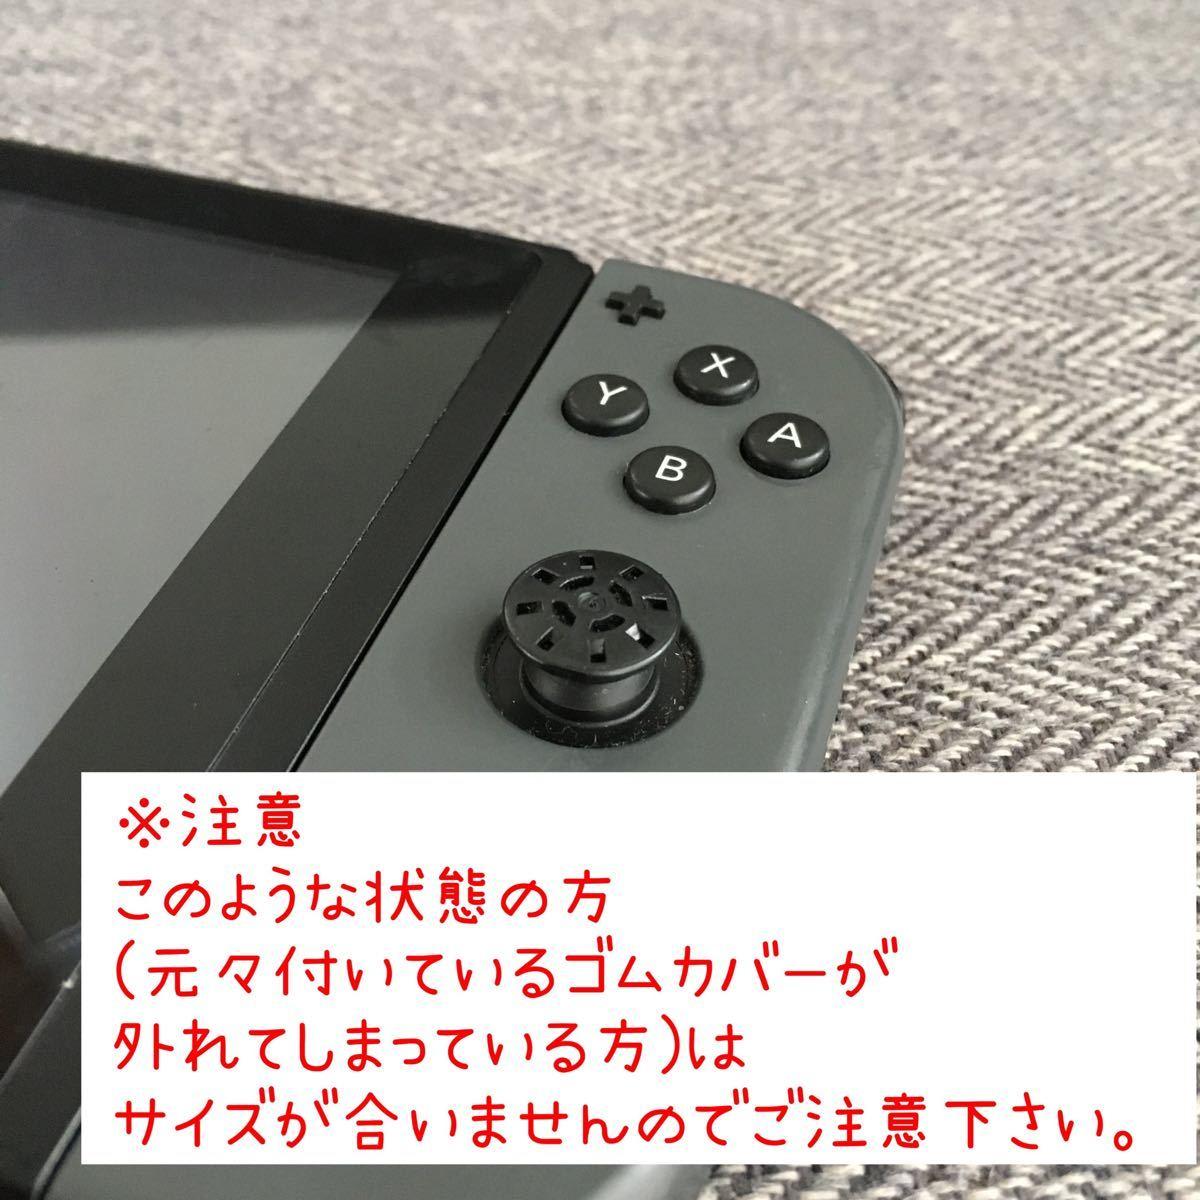 Switch スイッチ ジョイコン スティックカバー 肉球 2個【黒白】